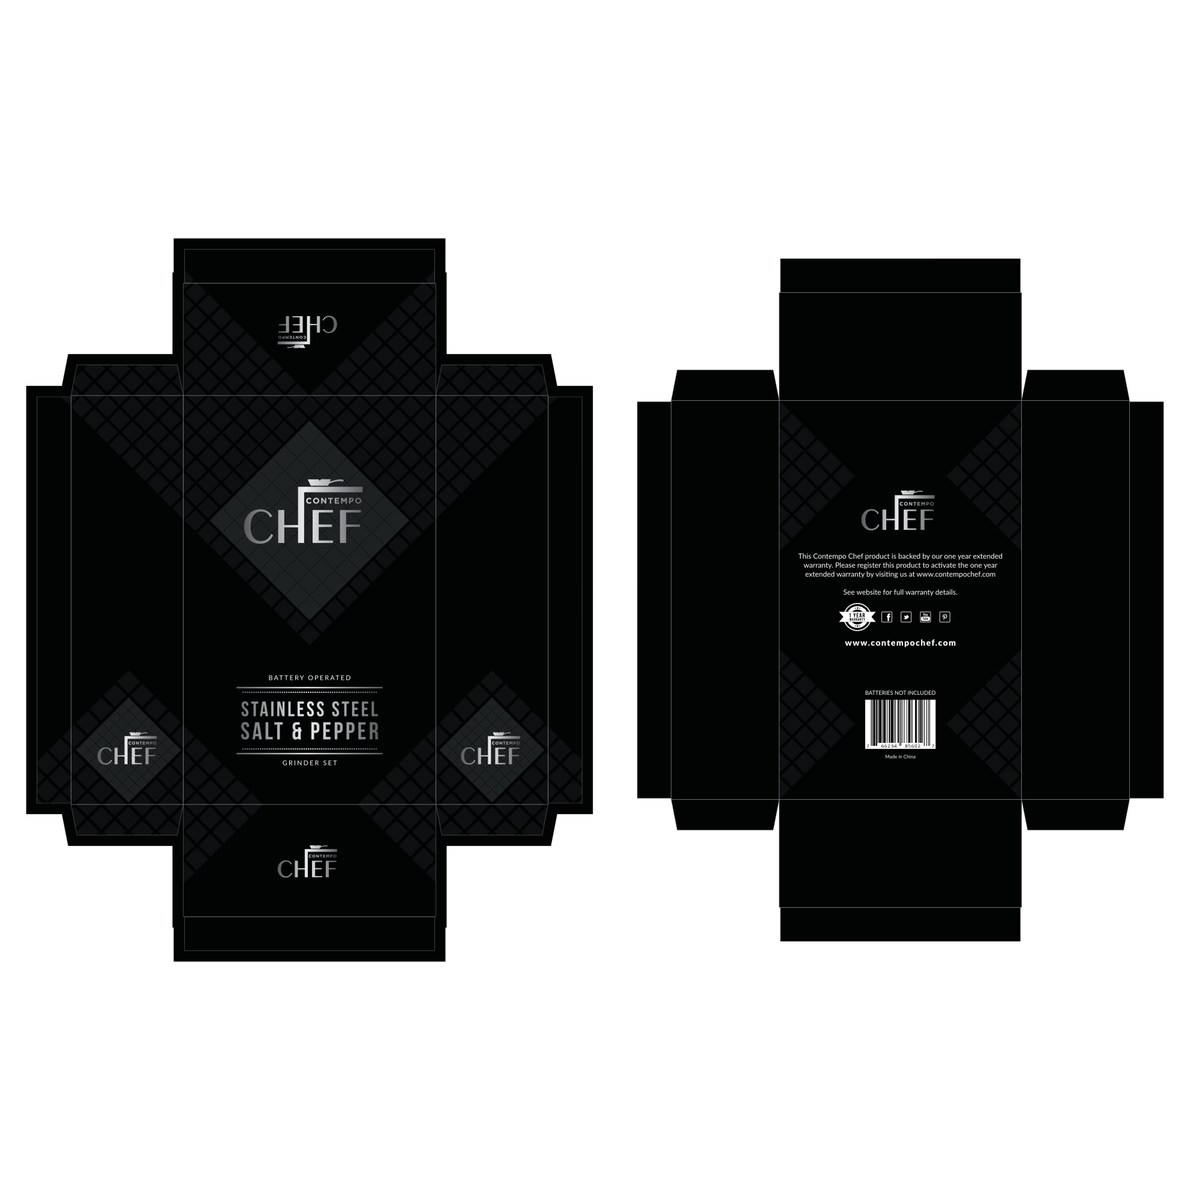 CONTEMPO CHEF - Printing supplier requesting small change